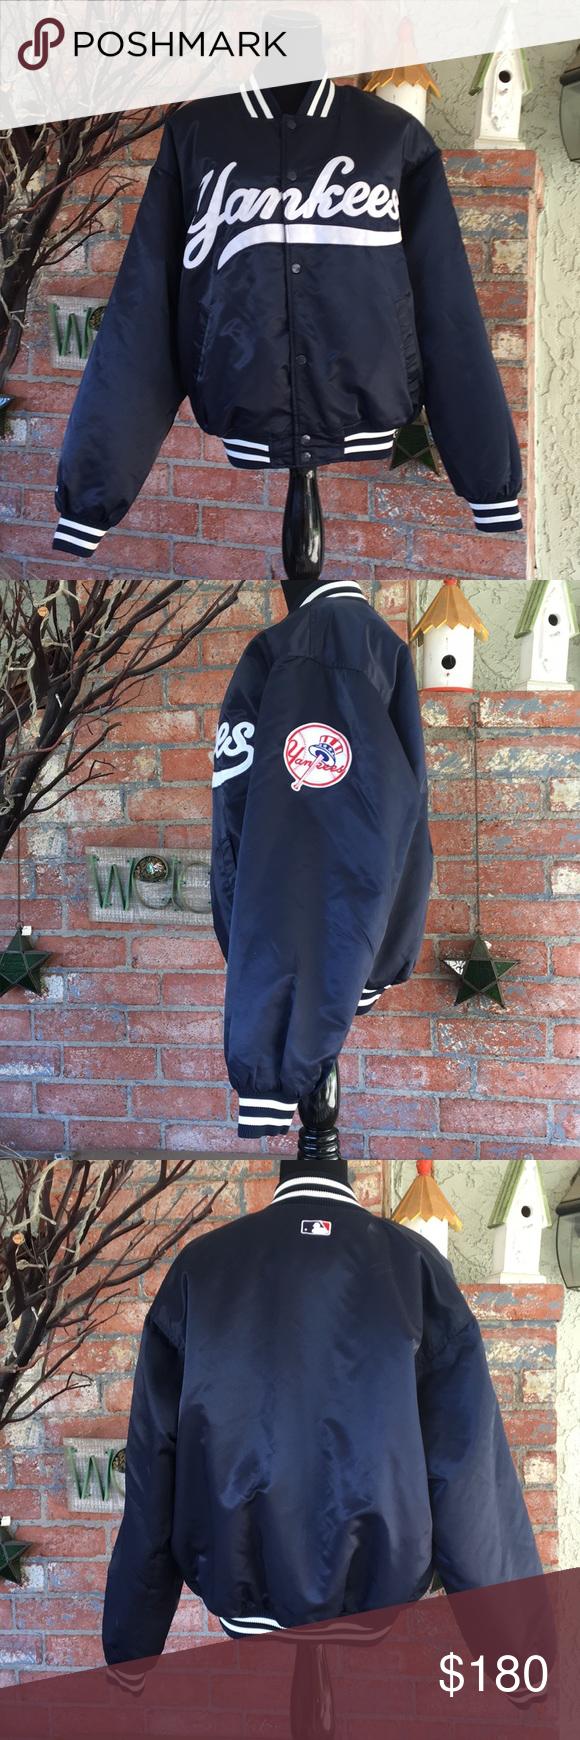 Rare Vintage Majestic Yankees Bomber Jacket Bomber Jacket Vintage Bomber Jacket Clothes Design